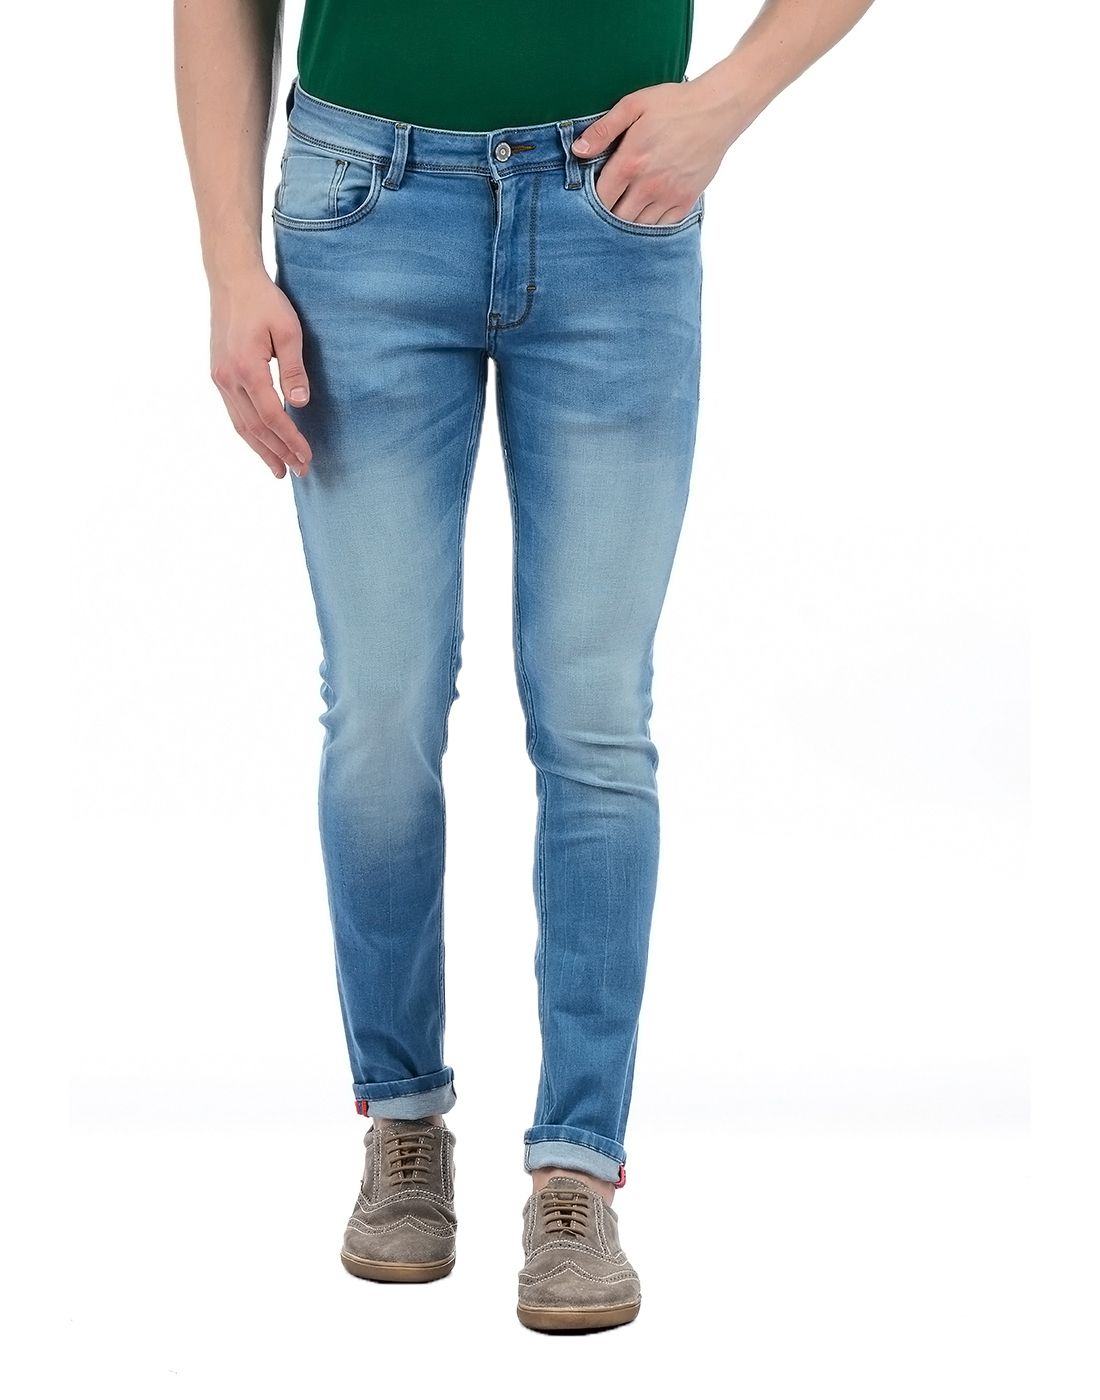 IZOD Blue Slim Jeans